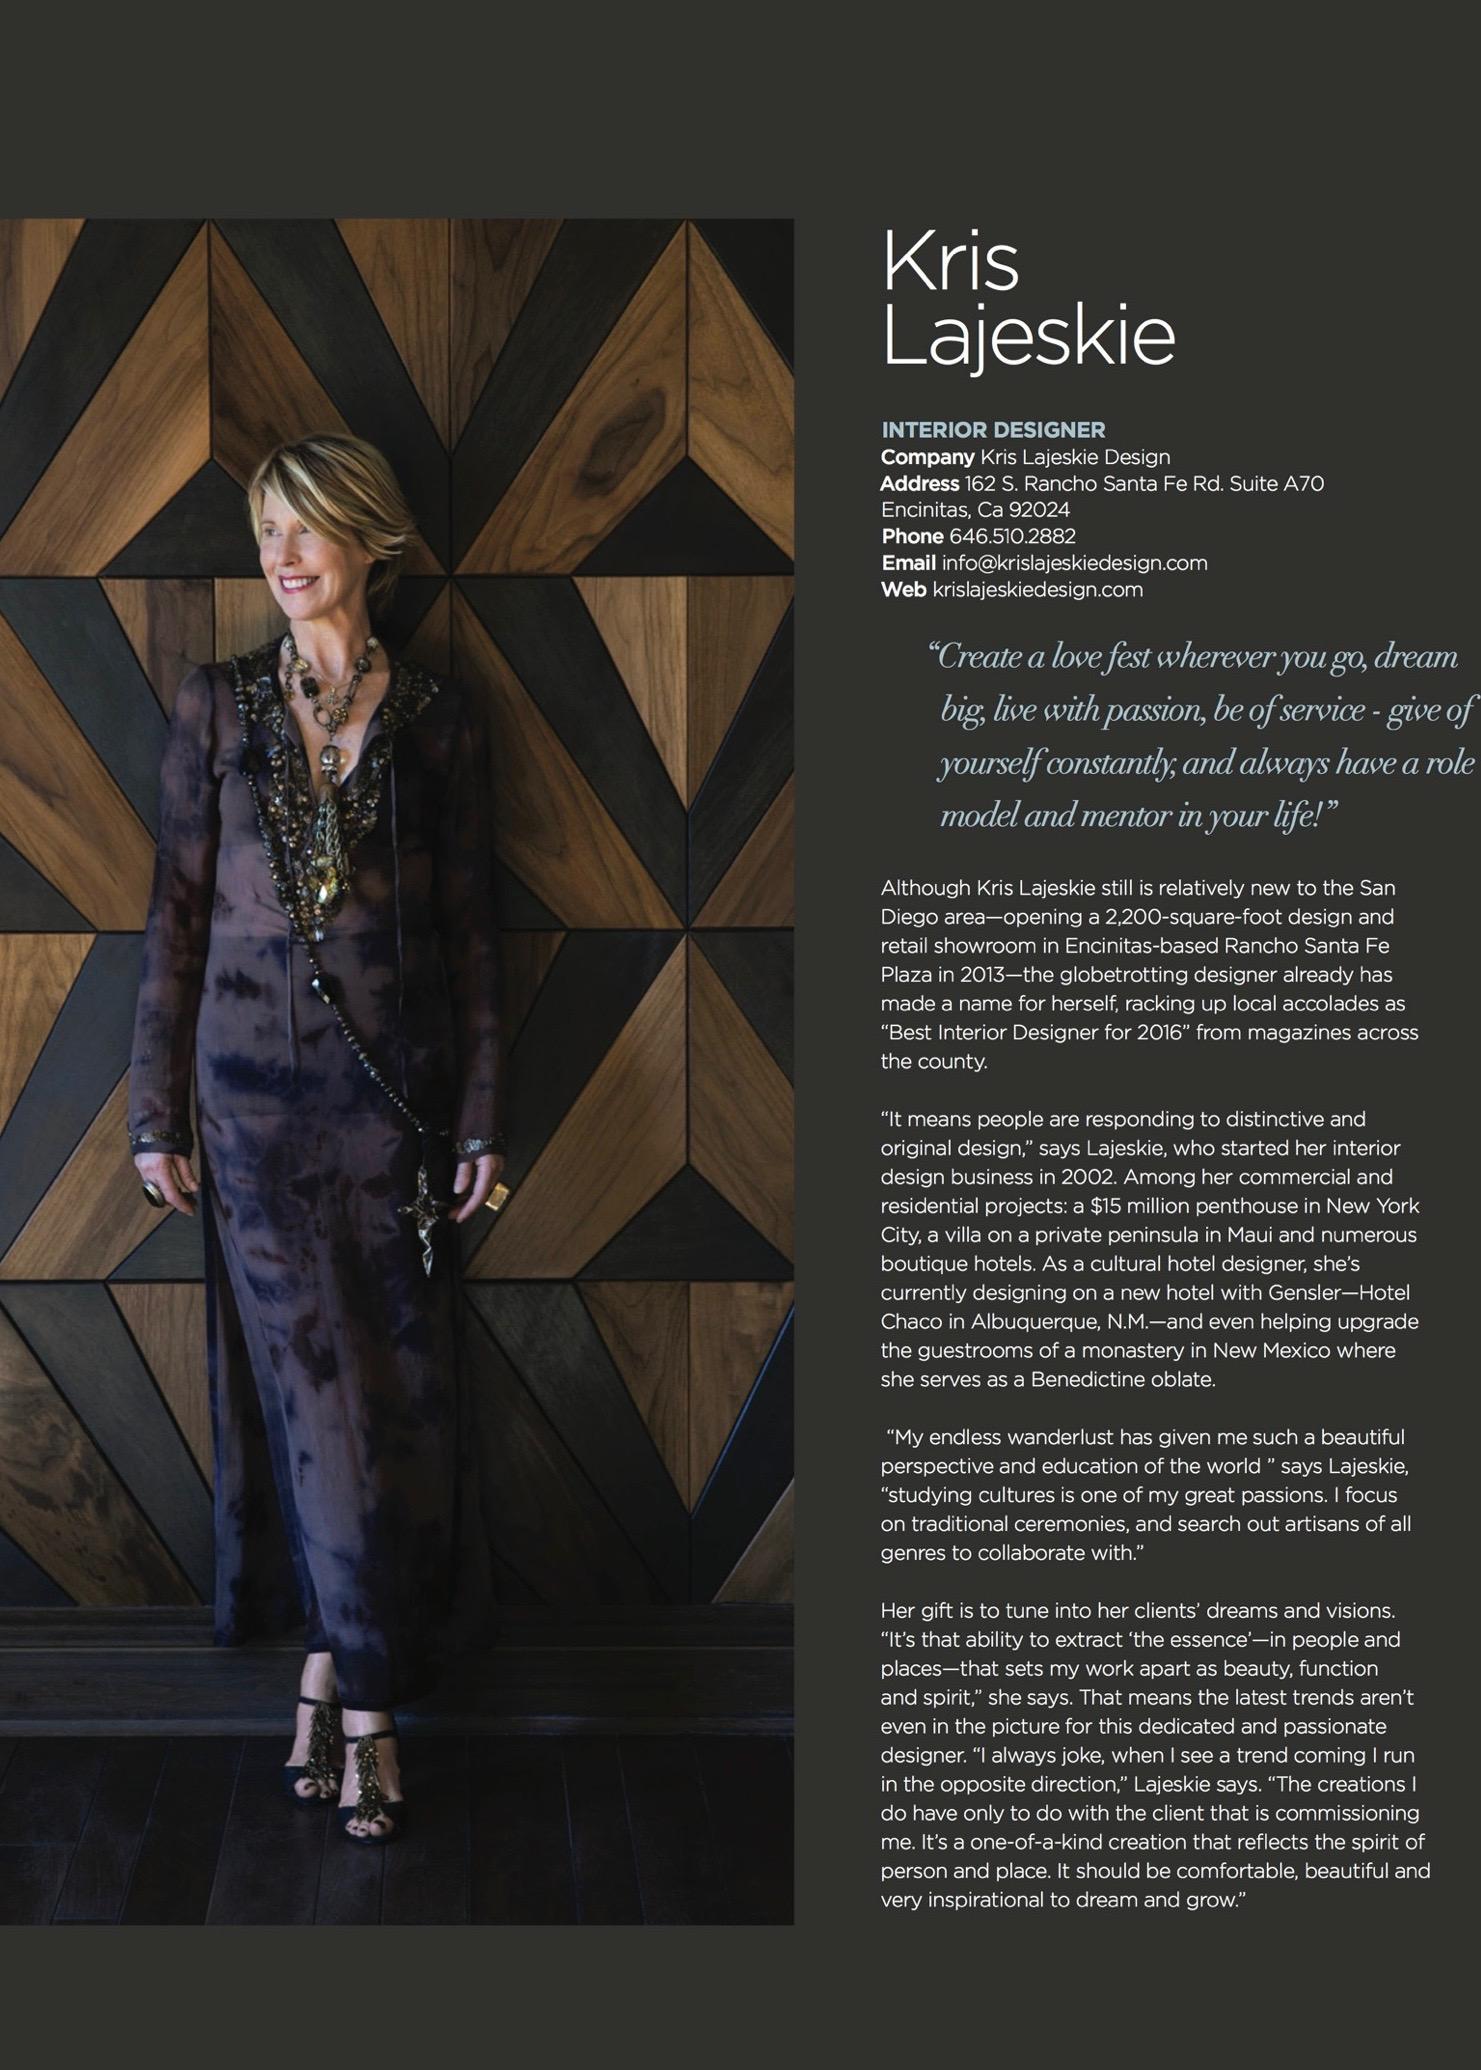 Kris Lajeskie Contact